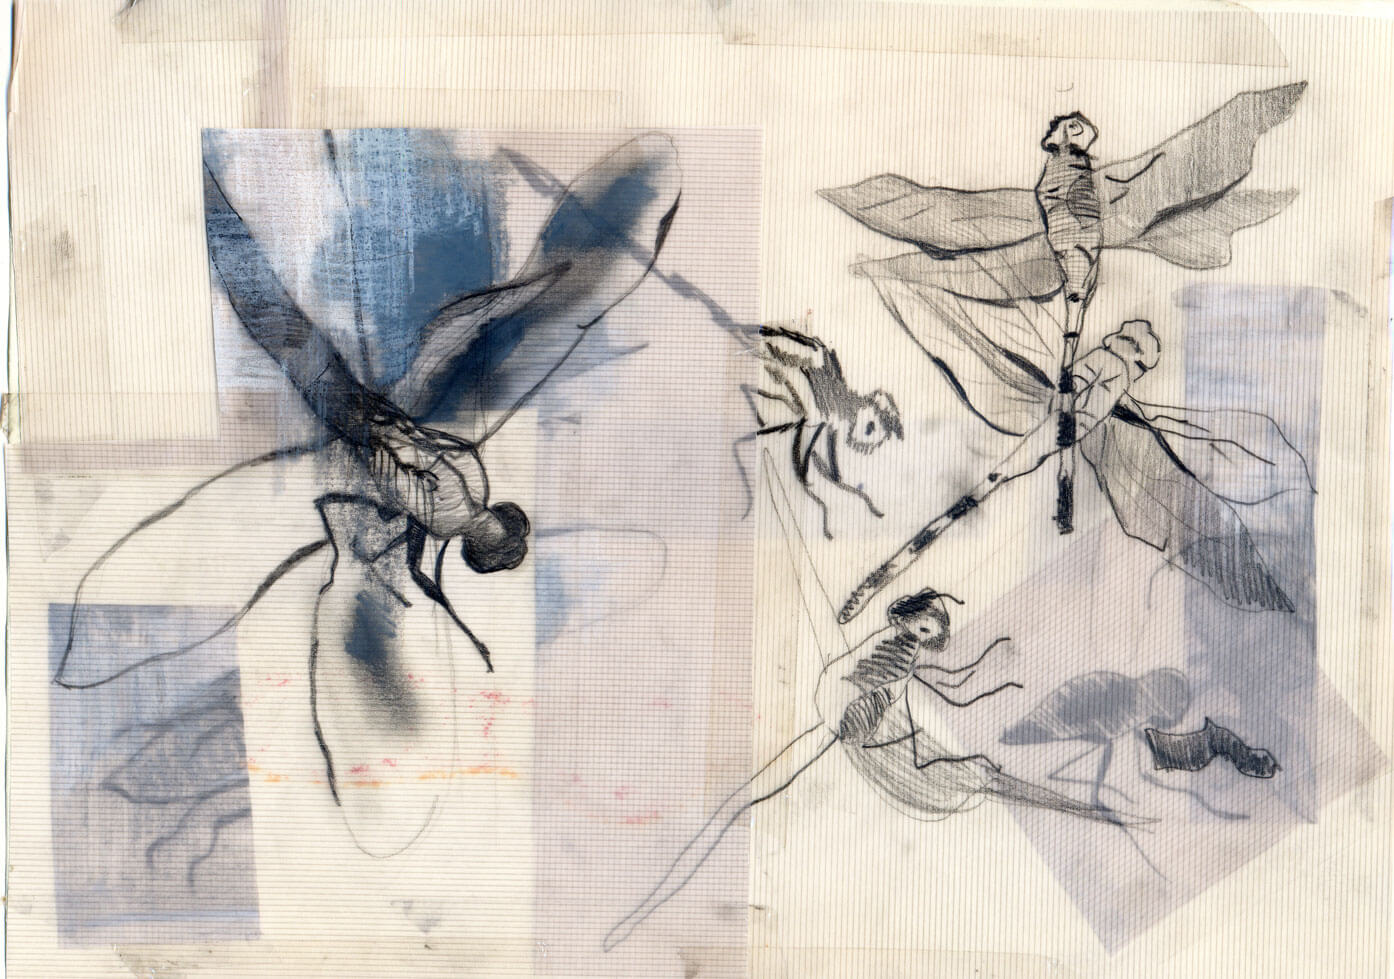 Lilliput, graphite on vellum paper, 21 x 29 cm., 2006.